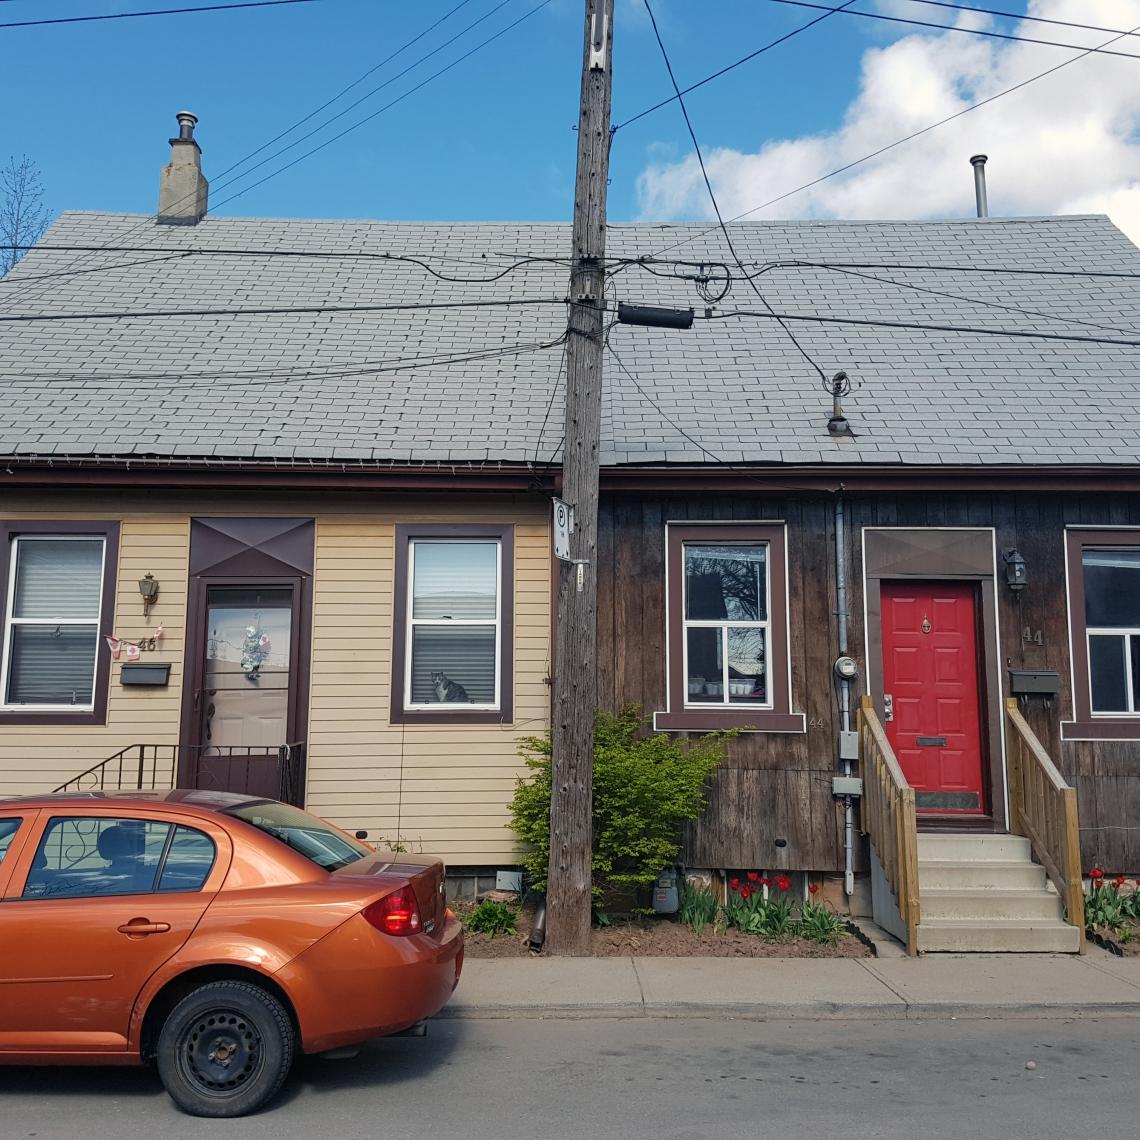 19th century Worker Housing, Hamilton (Ont).